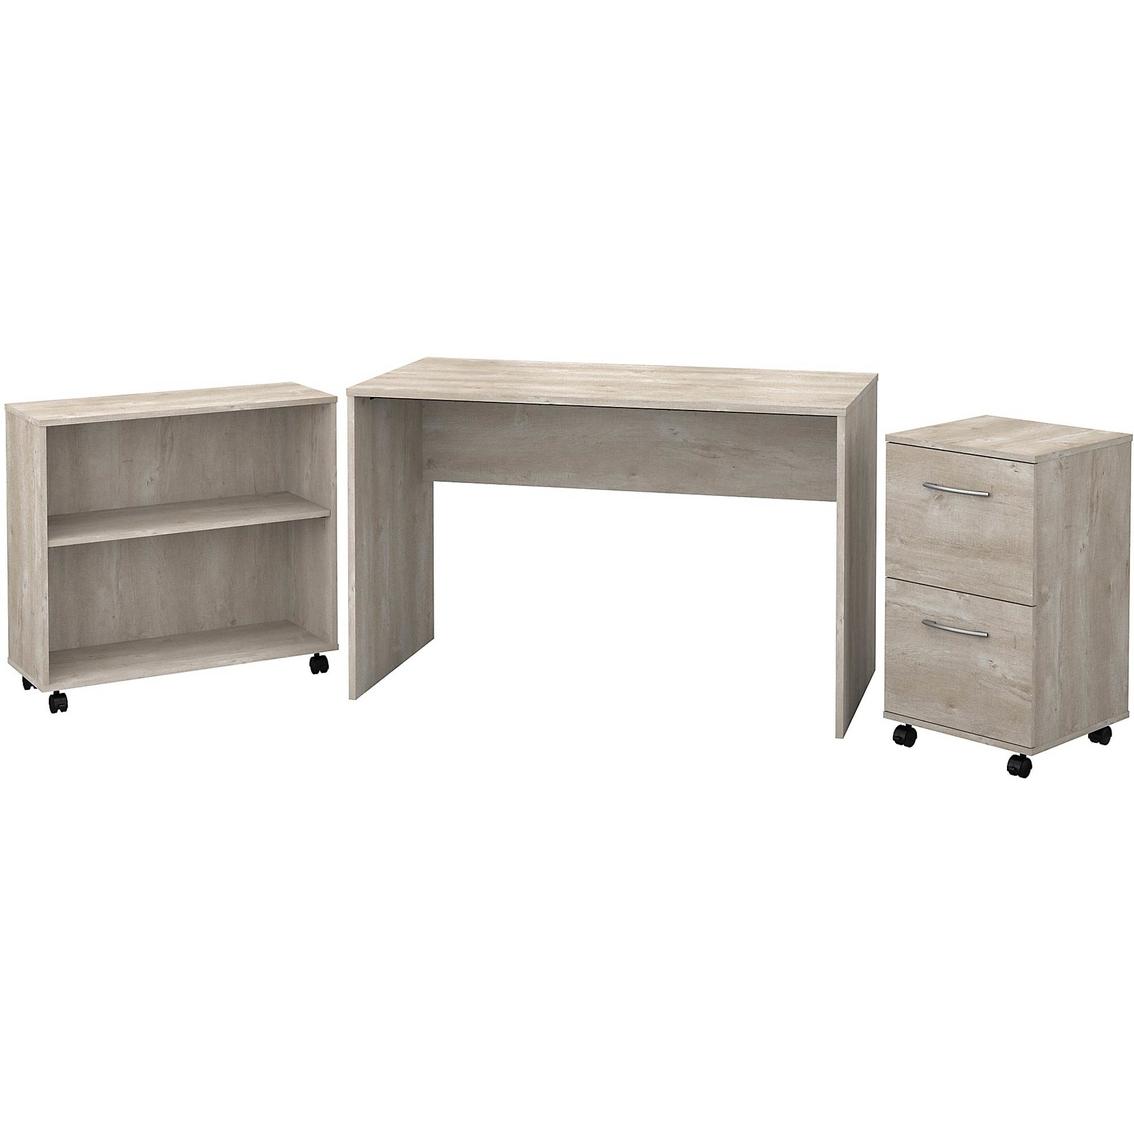 Bush Furniture Office Complete Small Desk With Mobile File Cabinet